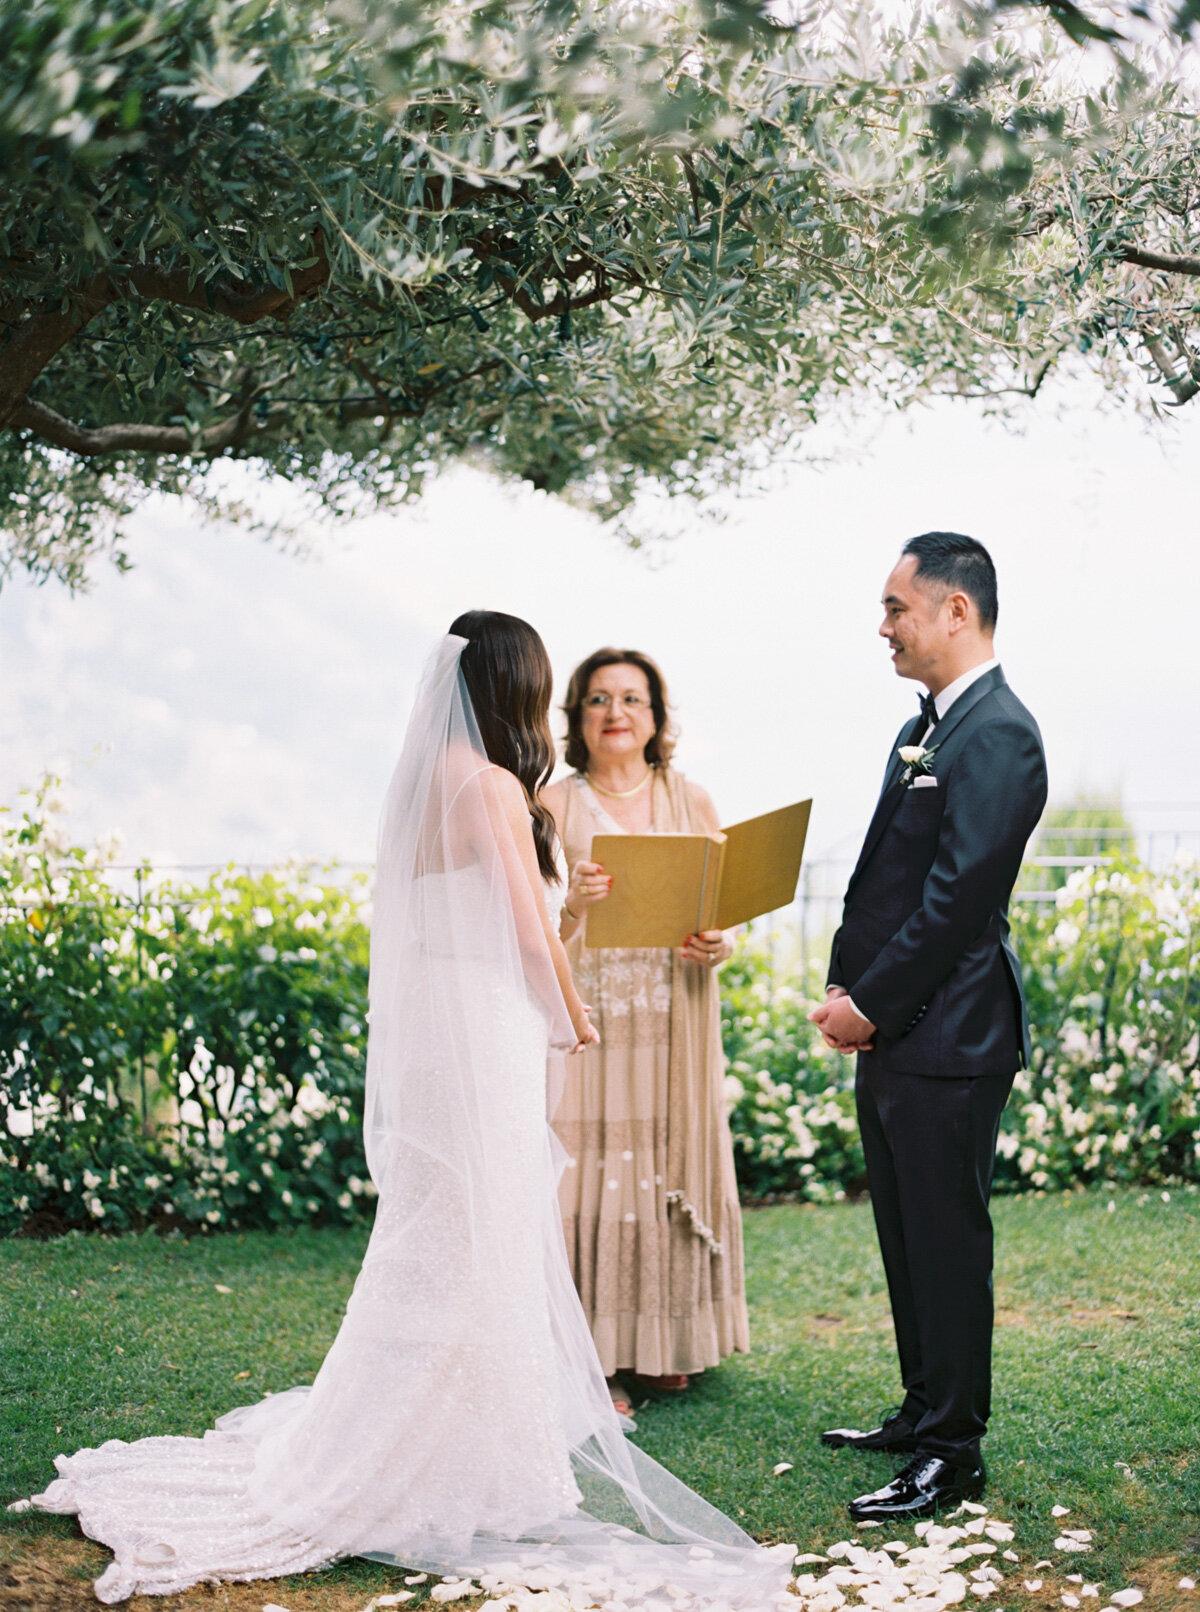 Belmond-Hotel-Caruso-ravello-elopement-Katie-Grant-destination-wedding (24 of 50).jpg